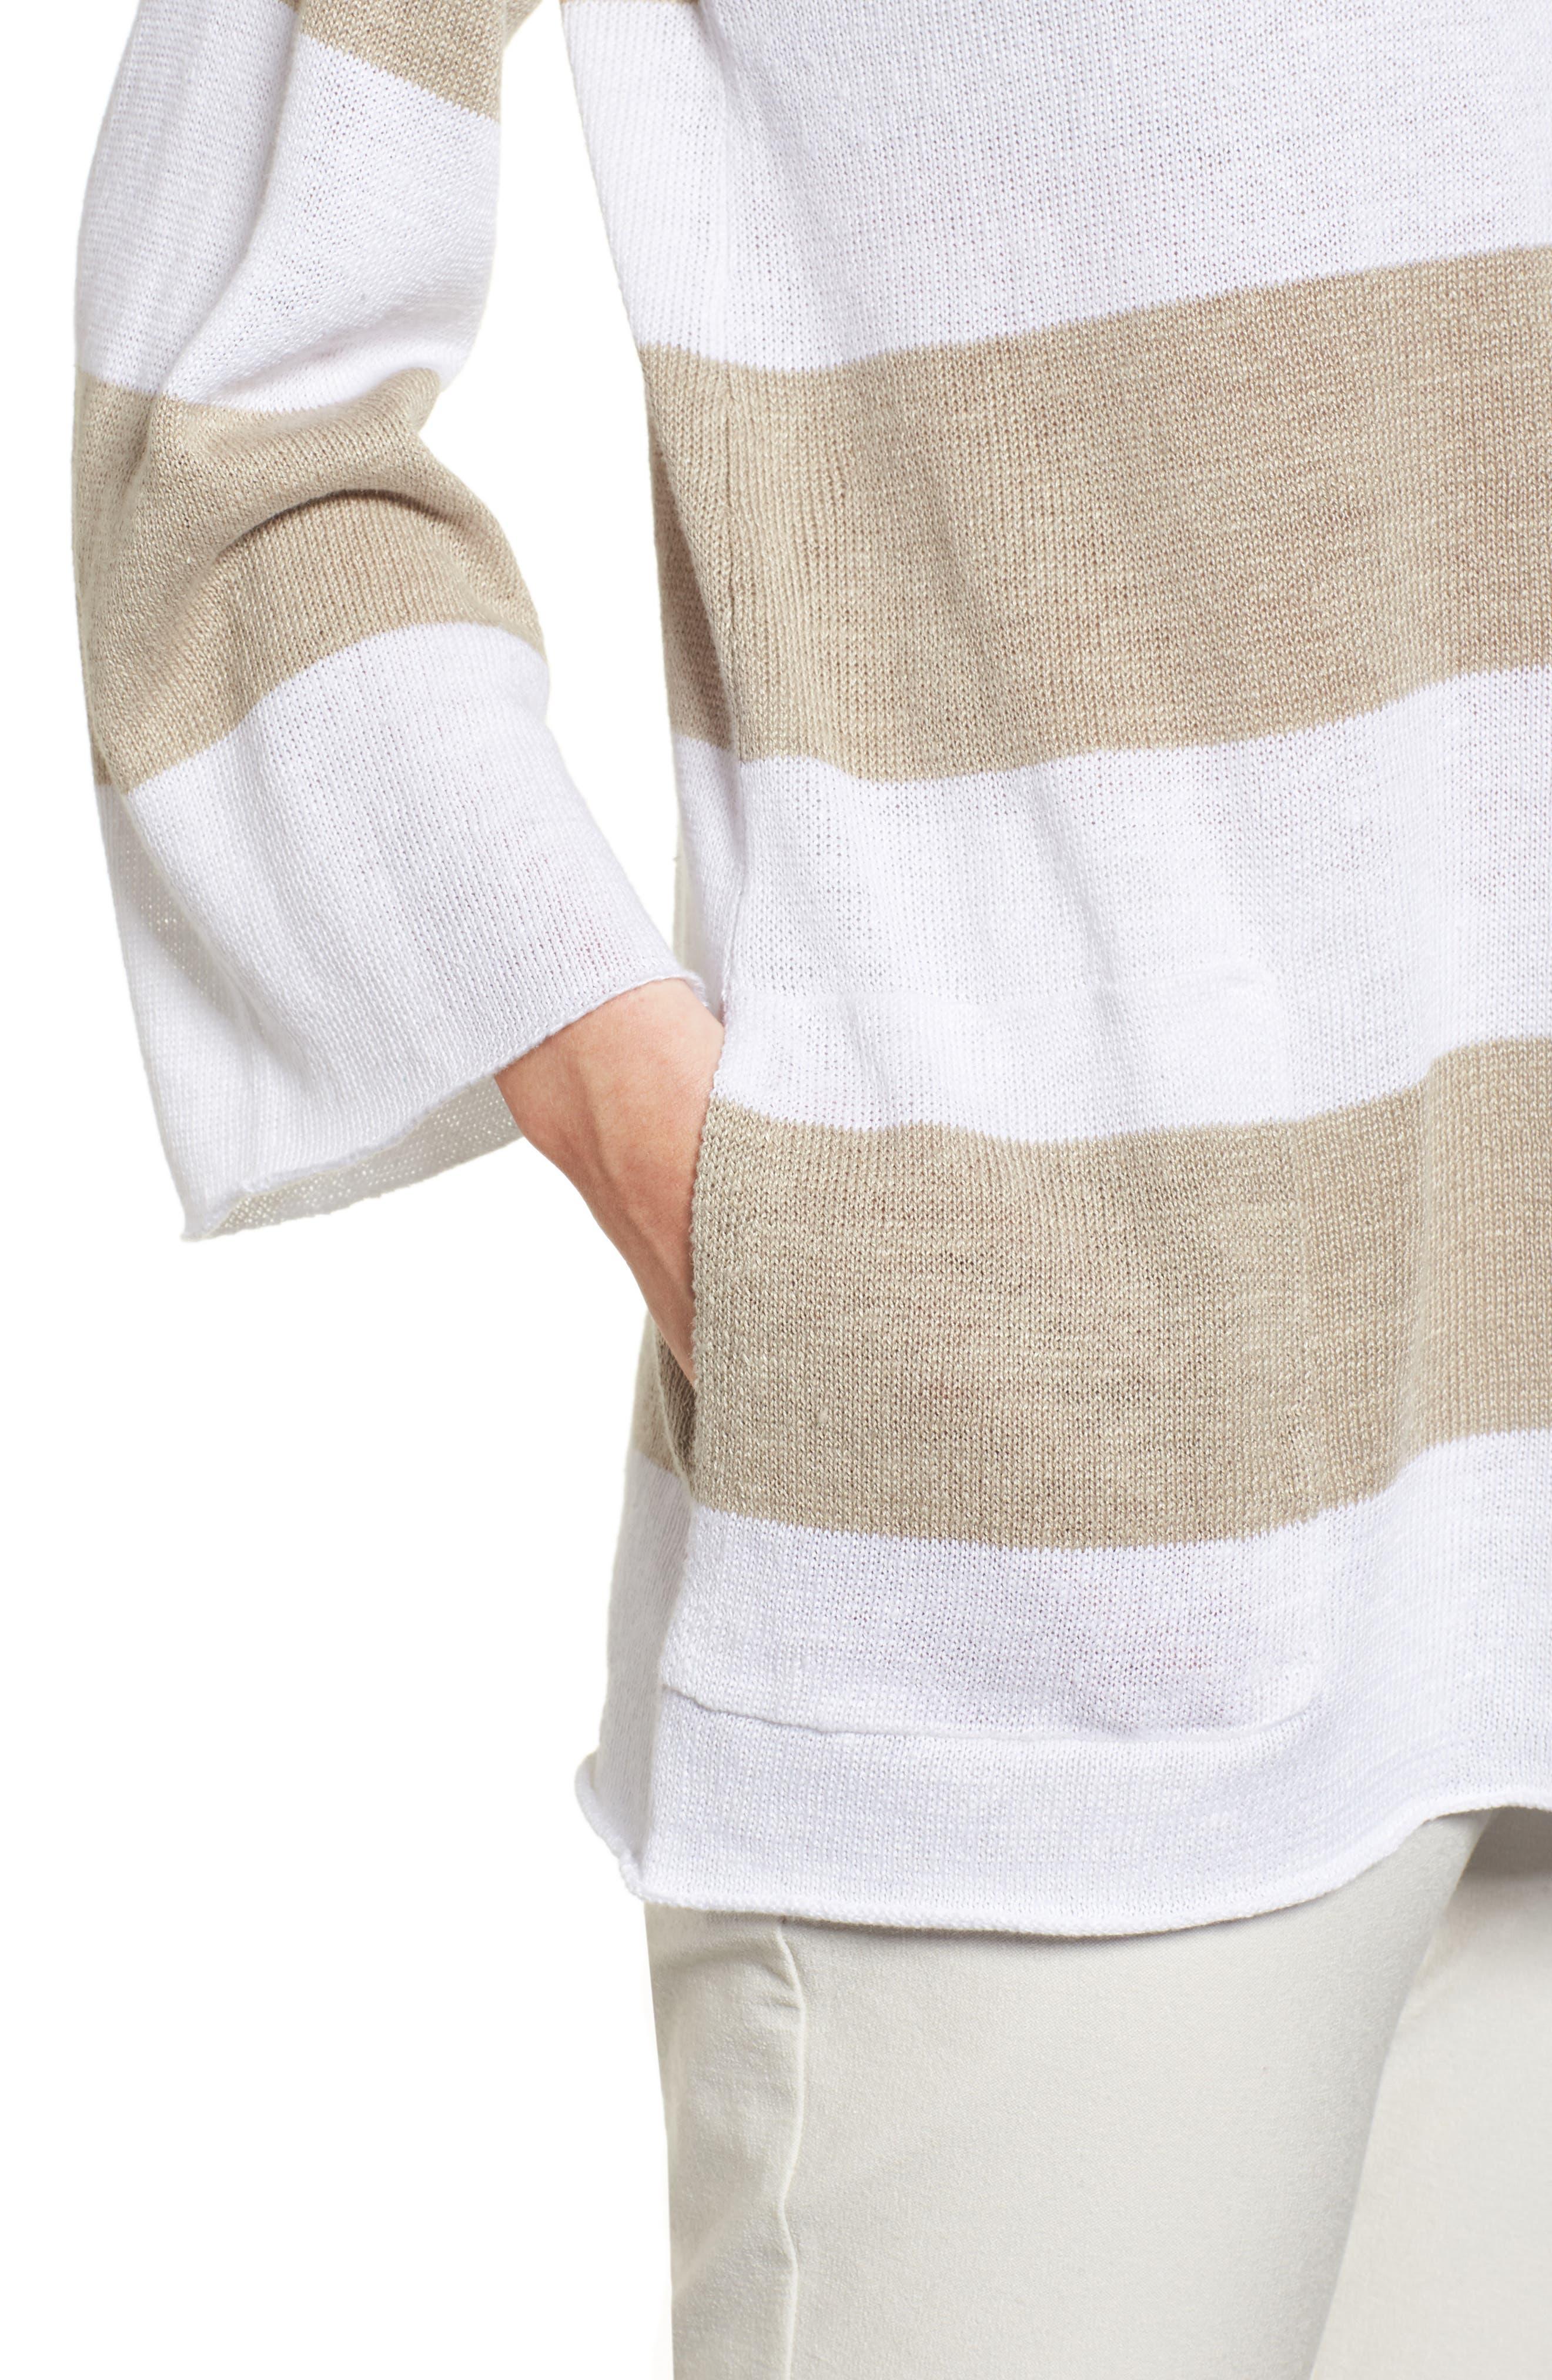 Stripe Organic Linen Knit A-Line Top,                             Alternate thumbnail 4, color,                             White/ Natural